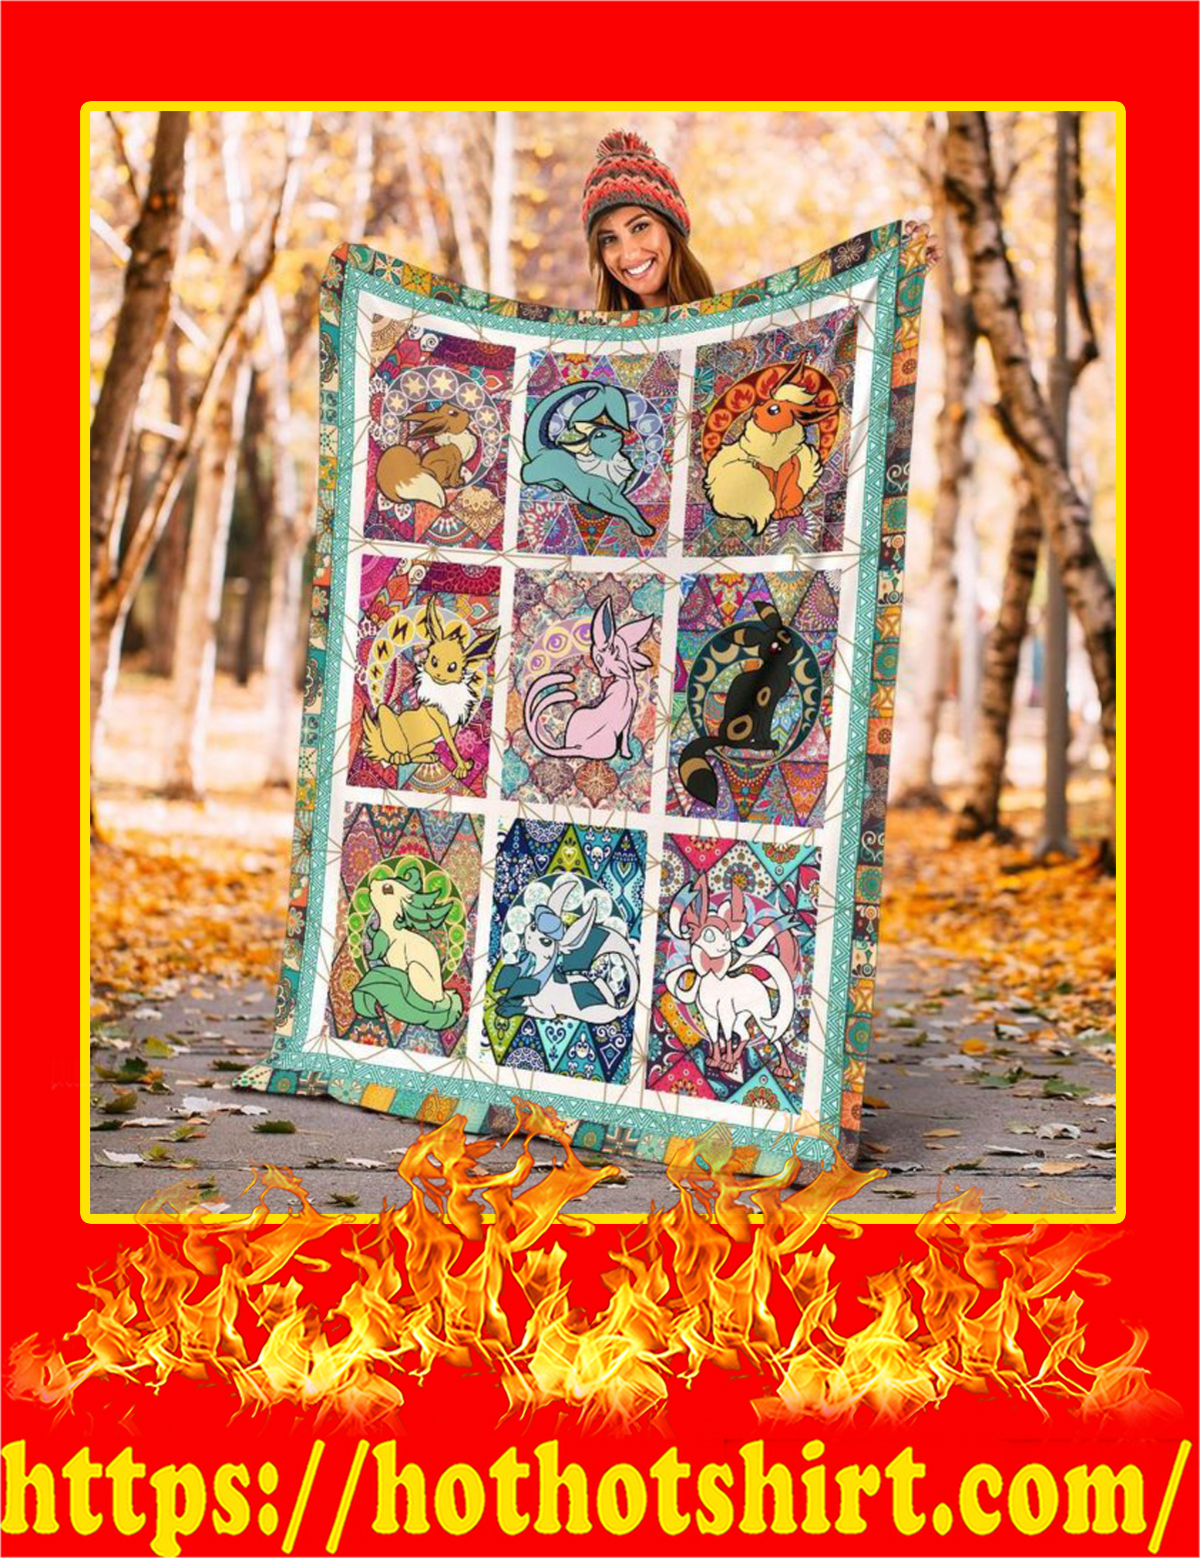 Eeveelutions Blanket - Large